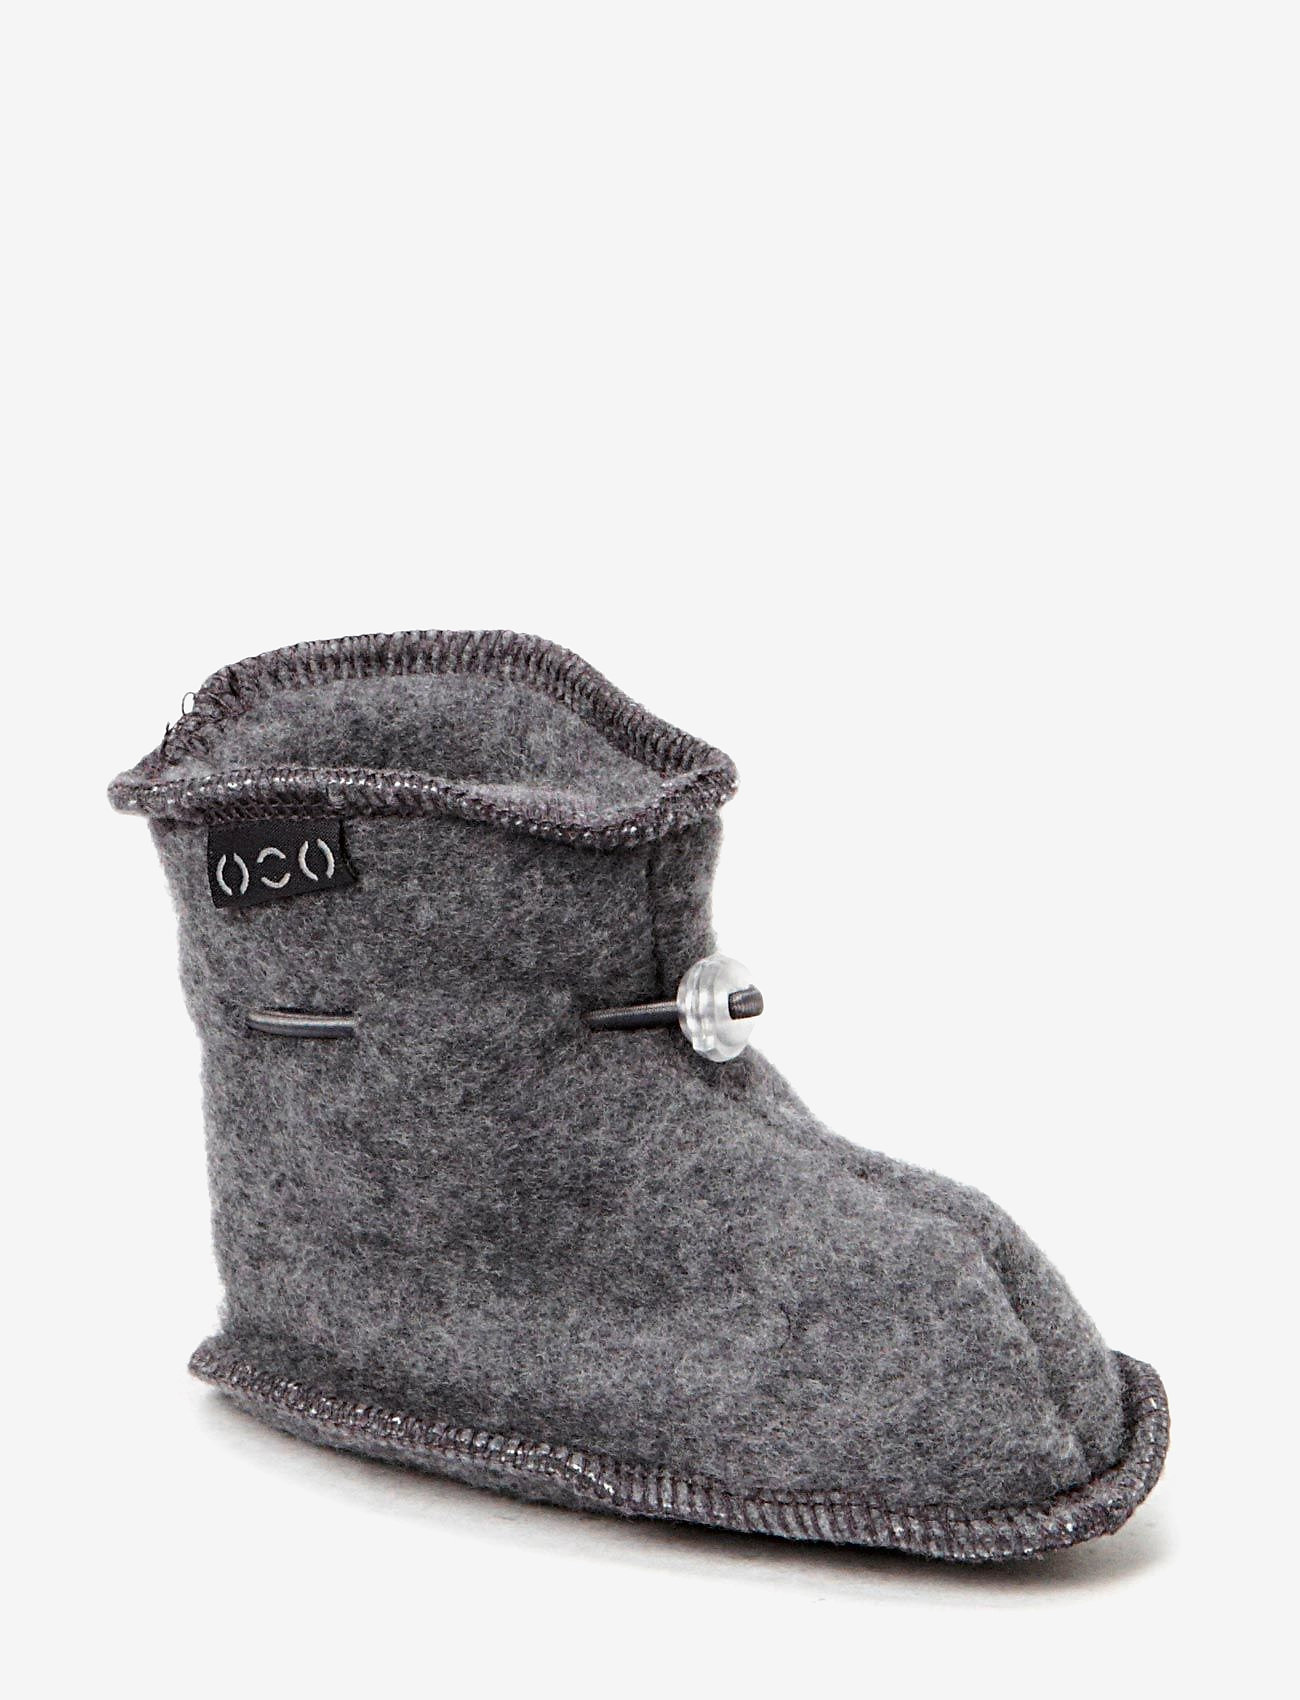 Mikk-Line - Wool baby shoe - hausschuhe - 916/175-189 m melange/grey - 0